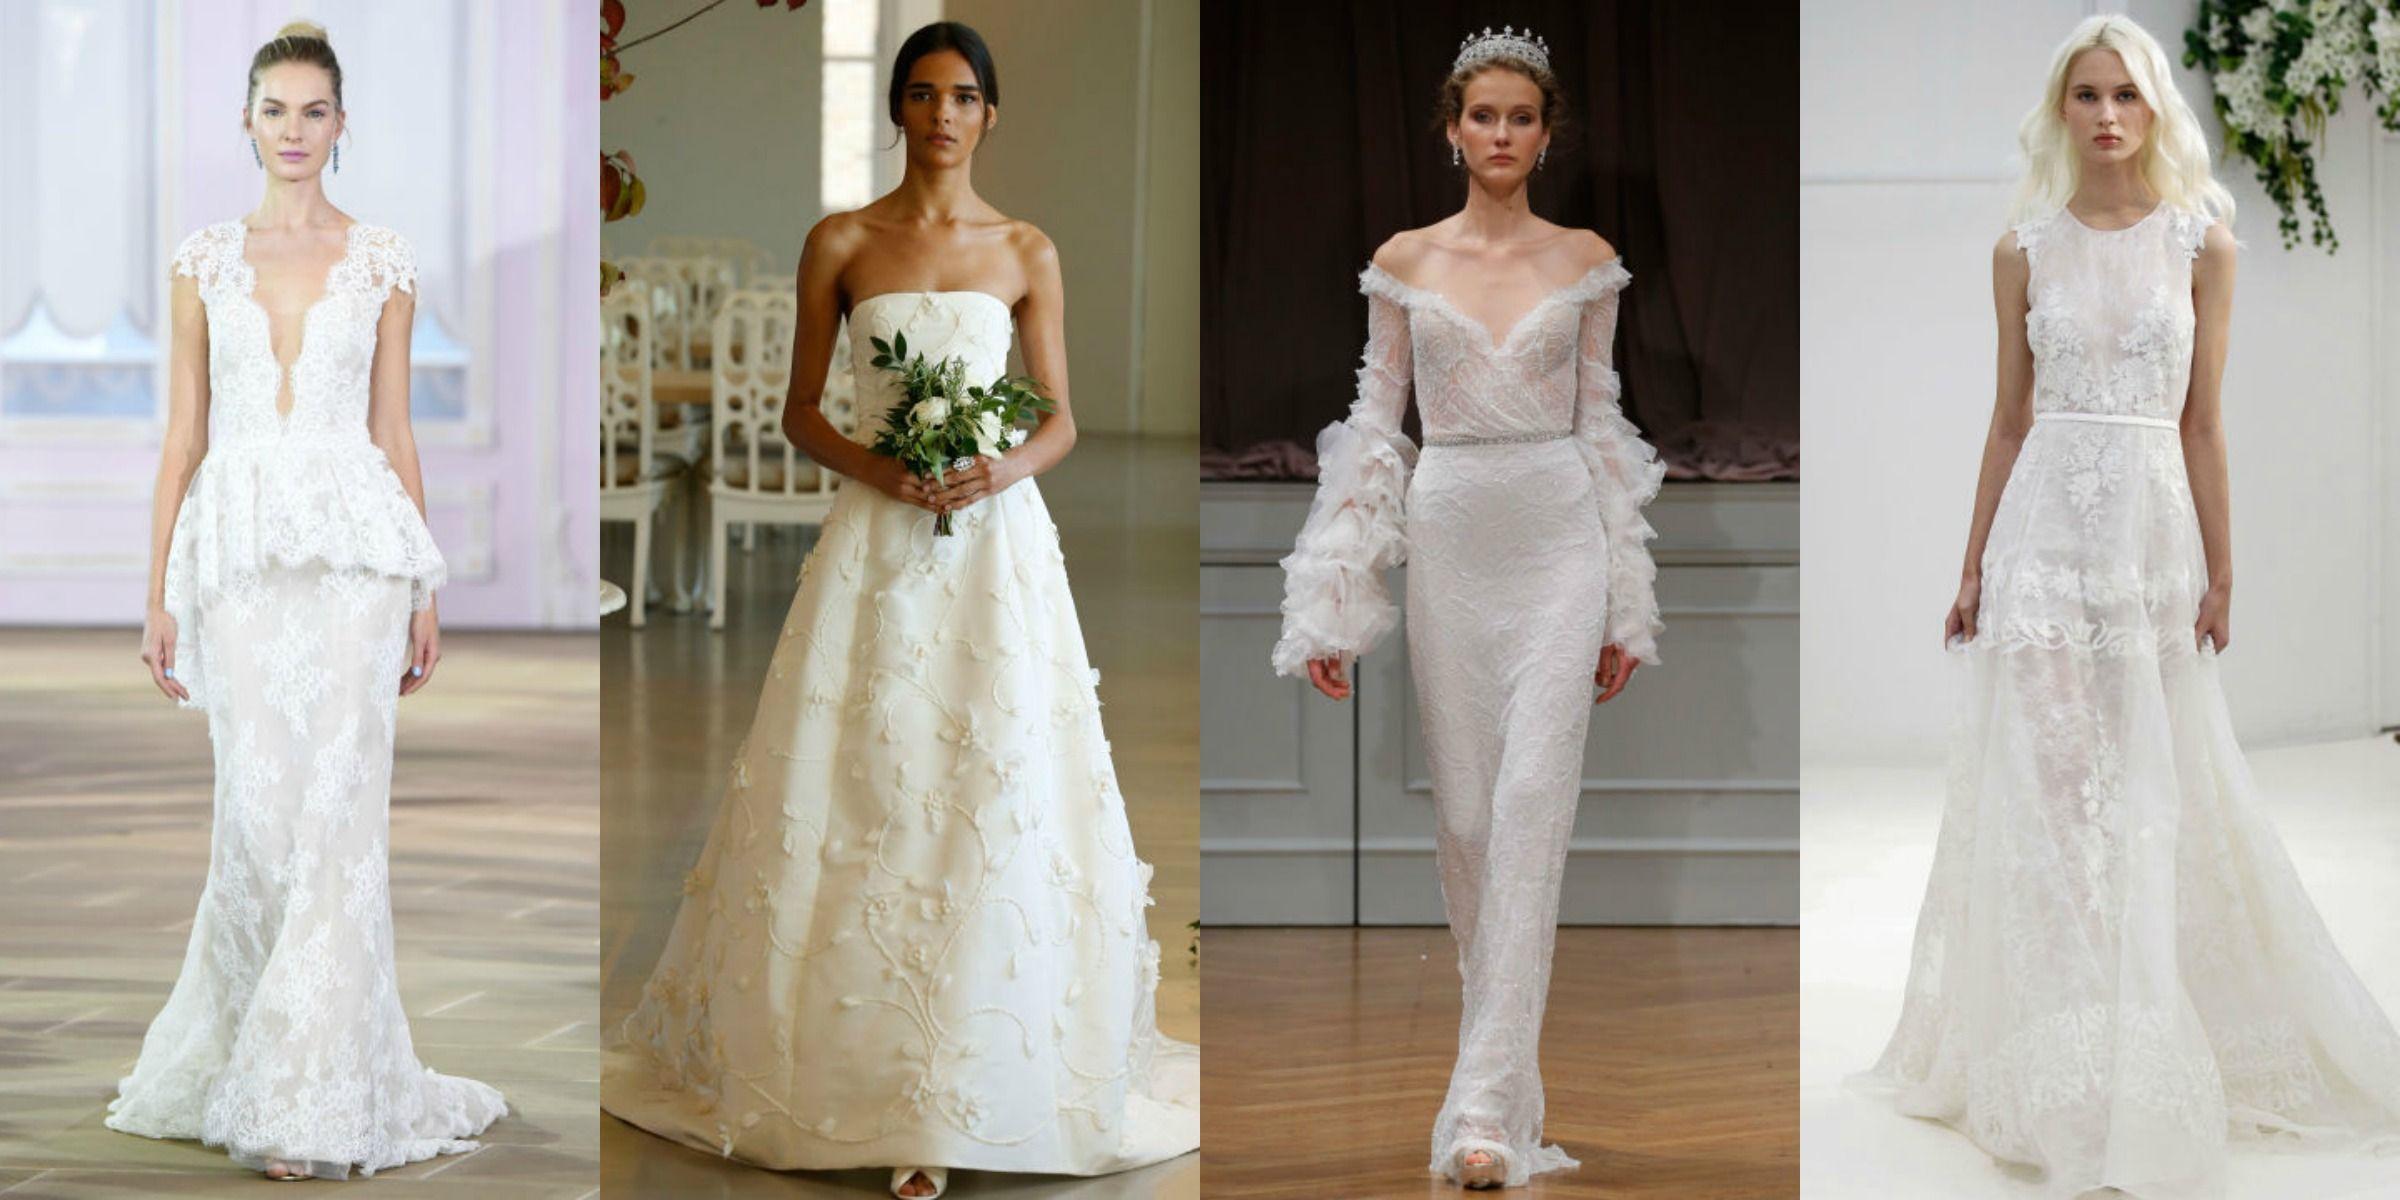 77db6d1aa36f8 50 abiti da sposa dalla Bridal fashion week di New York